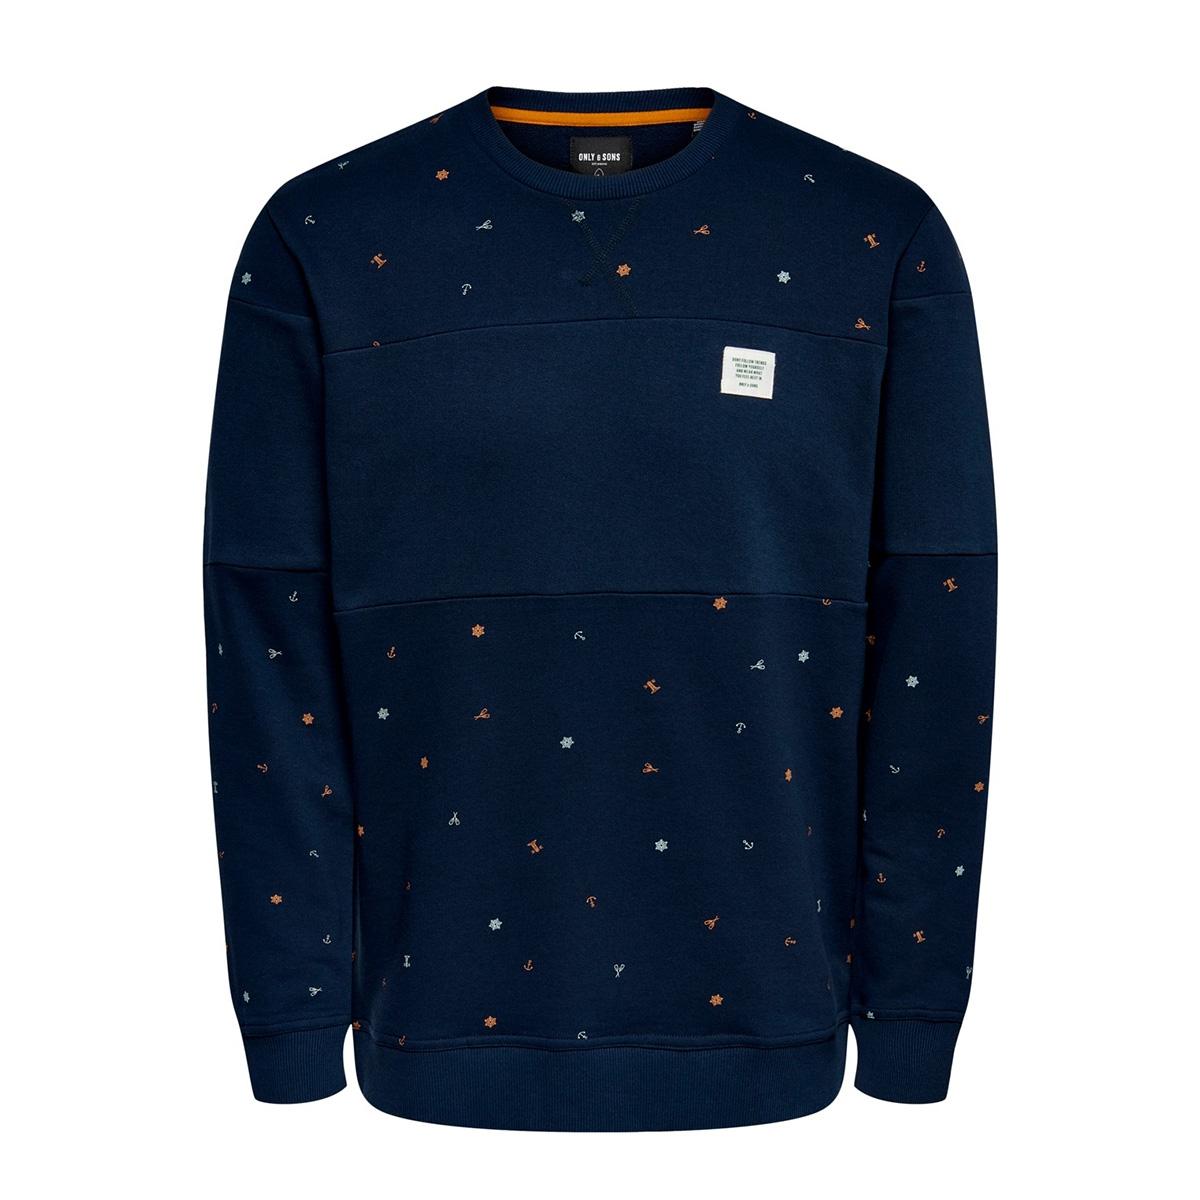 onsdexter reg crew neck sweat 22015400 only & sons sweater dress blues